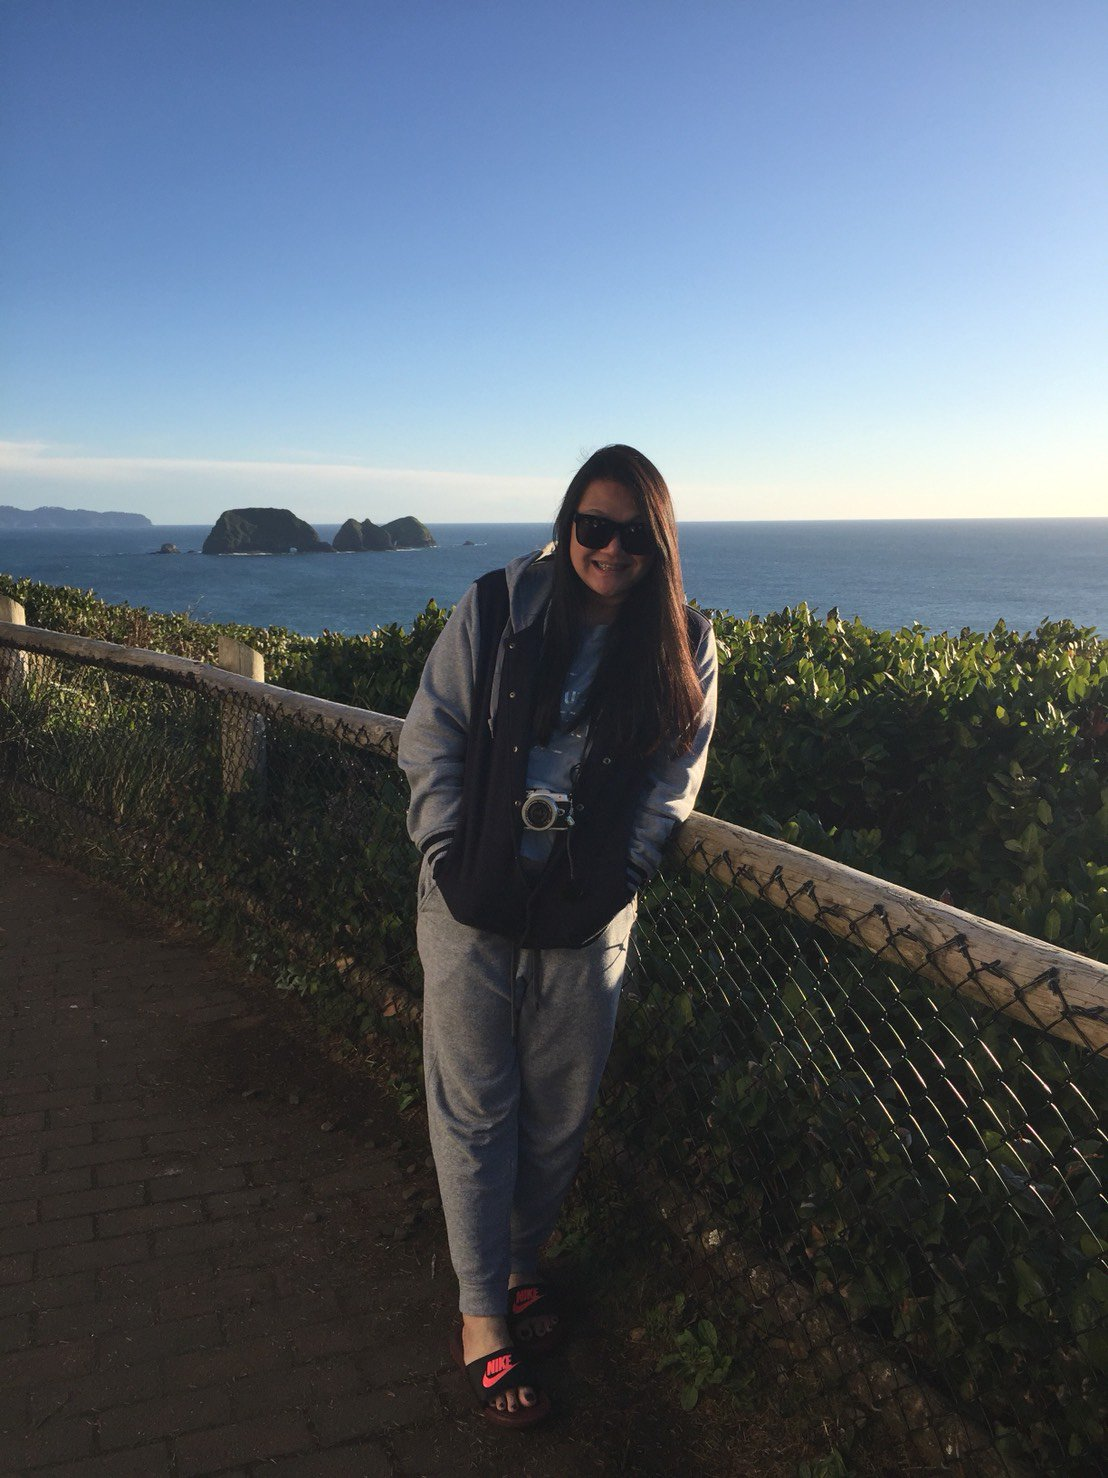 @Cape Meares #holiday #onvacation #oregon #portland #usa https://t.co/KEZP8dudQy